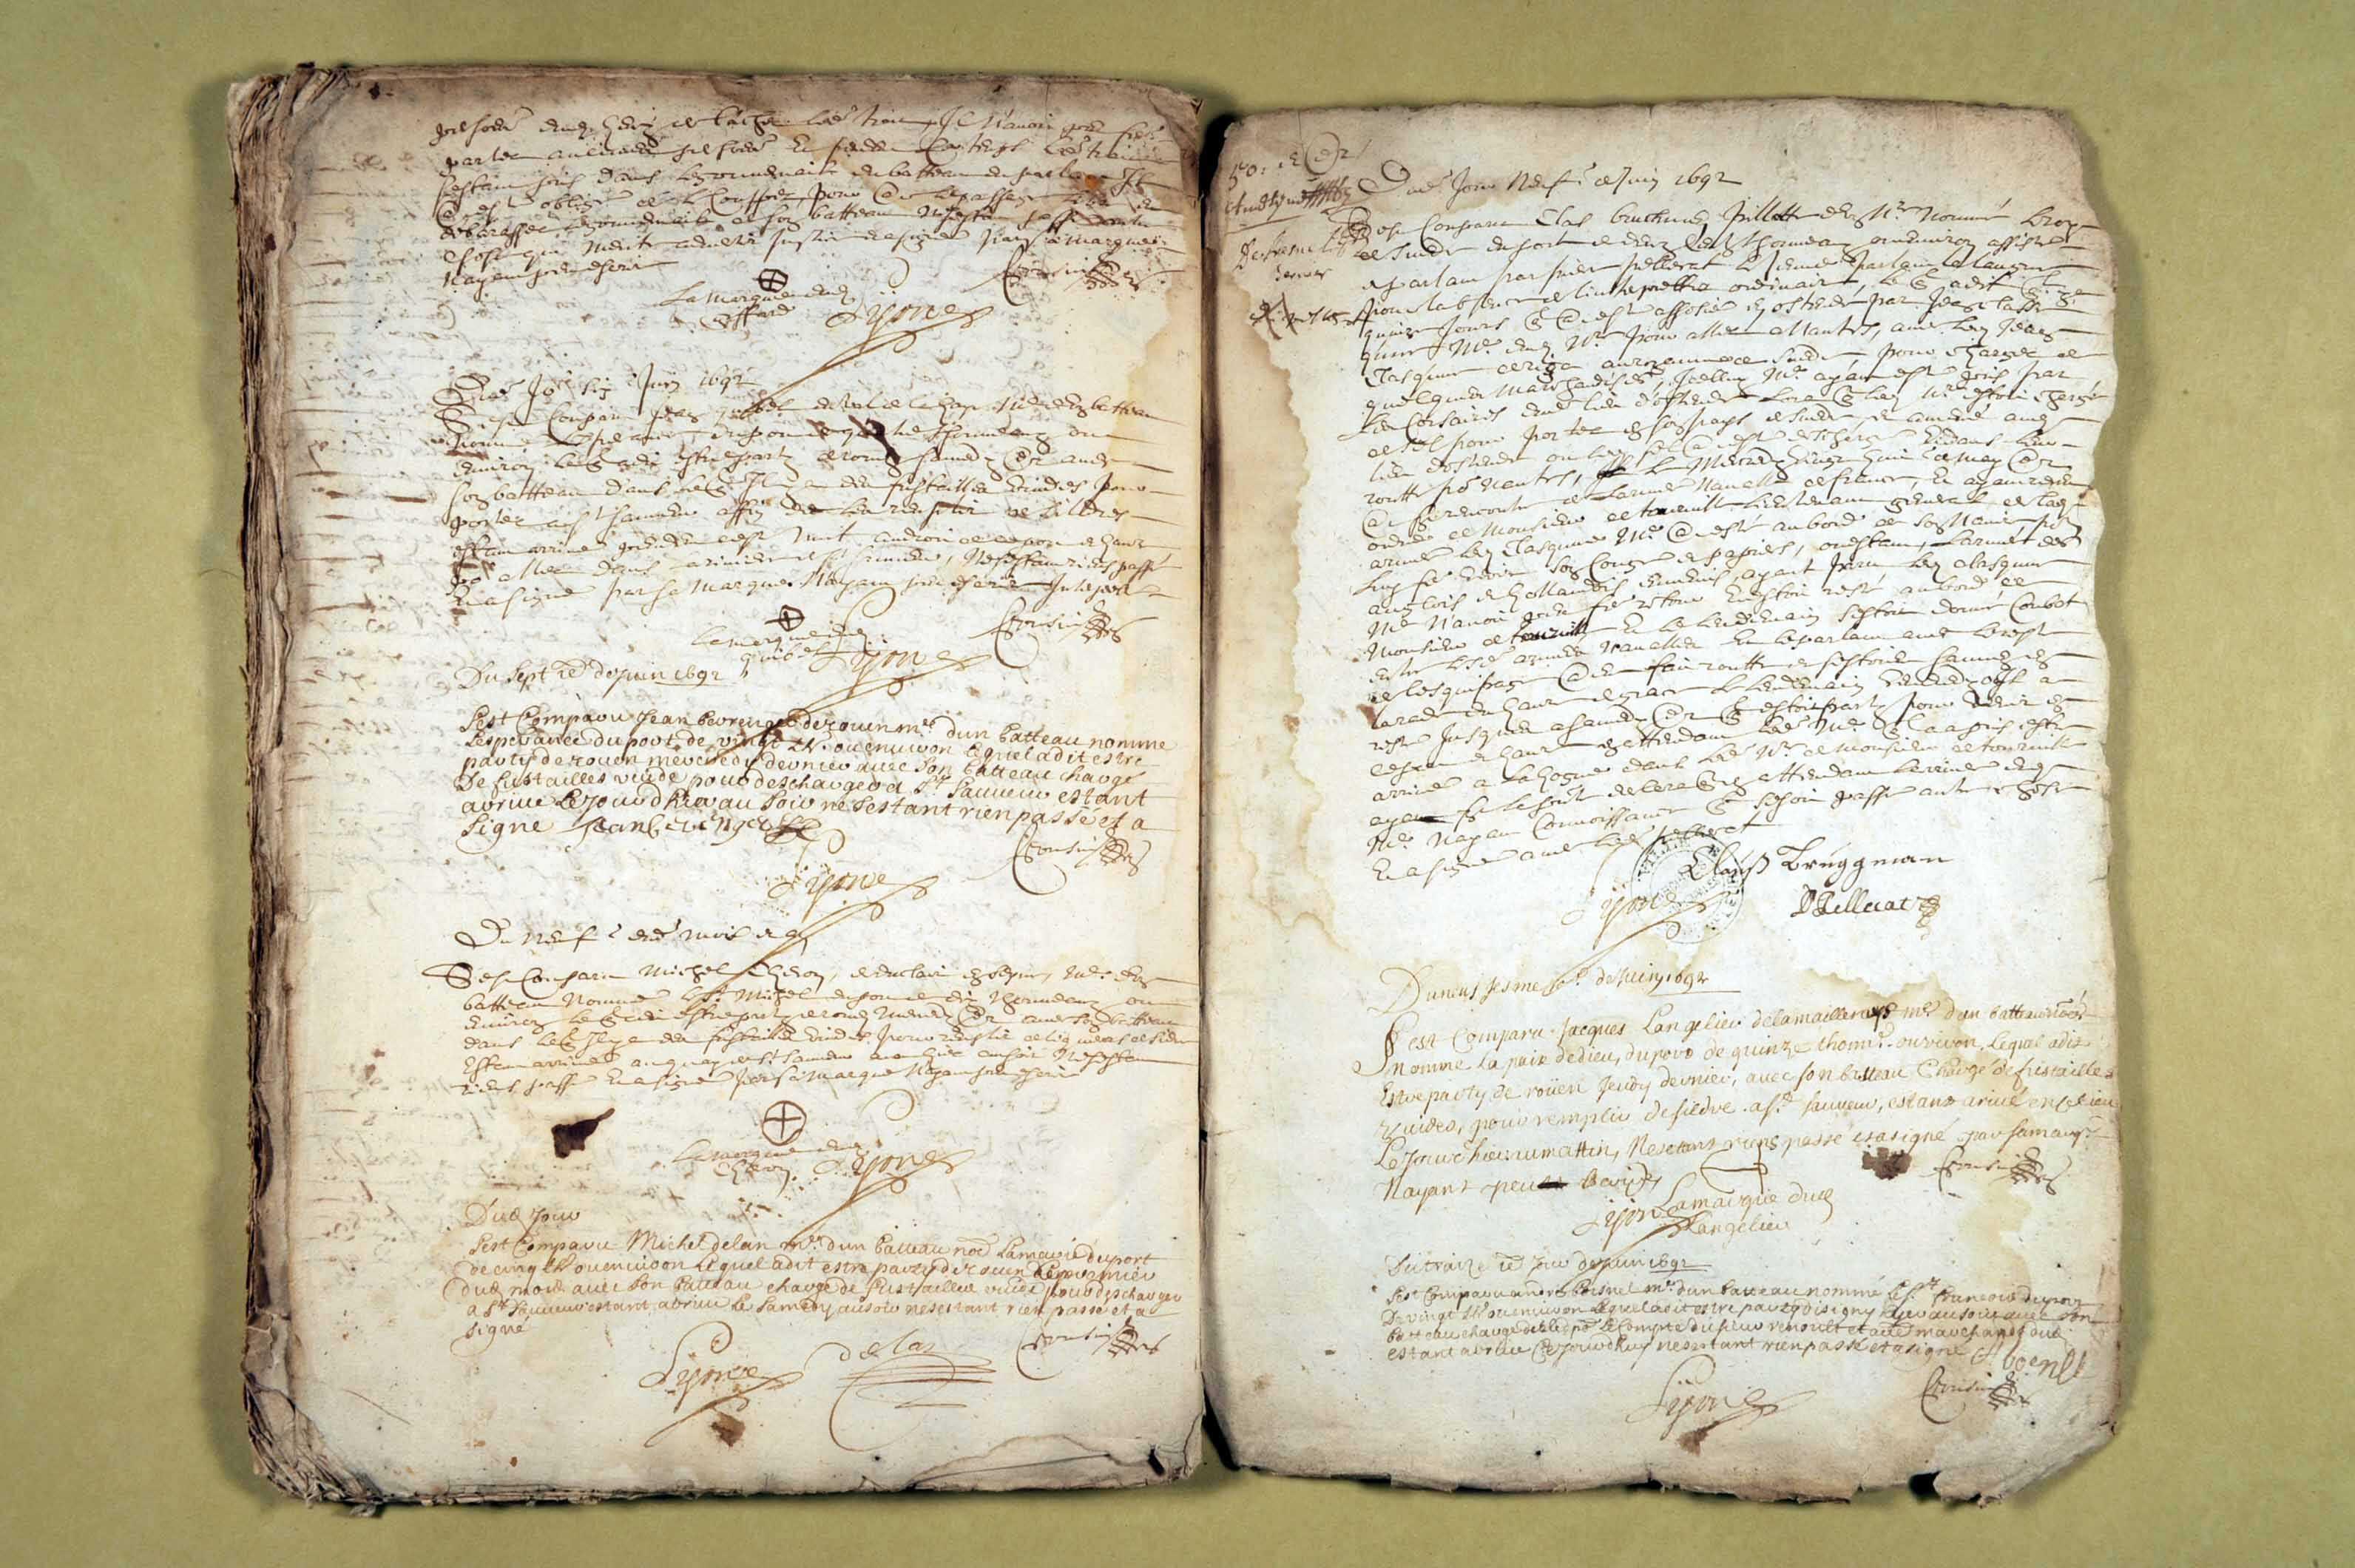 2 janvier 1691-25 juin 1692